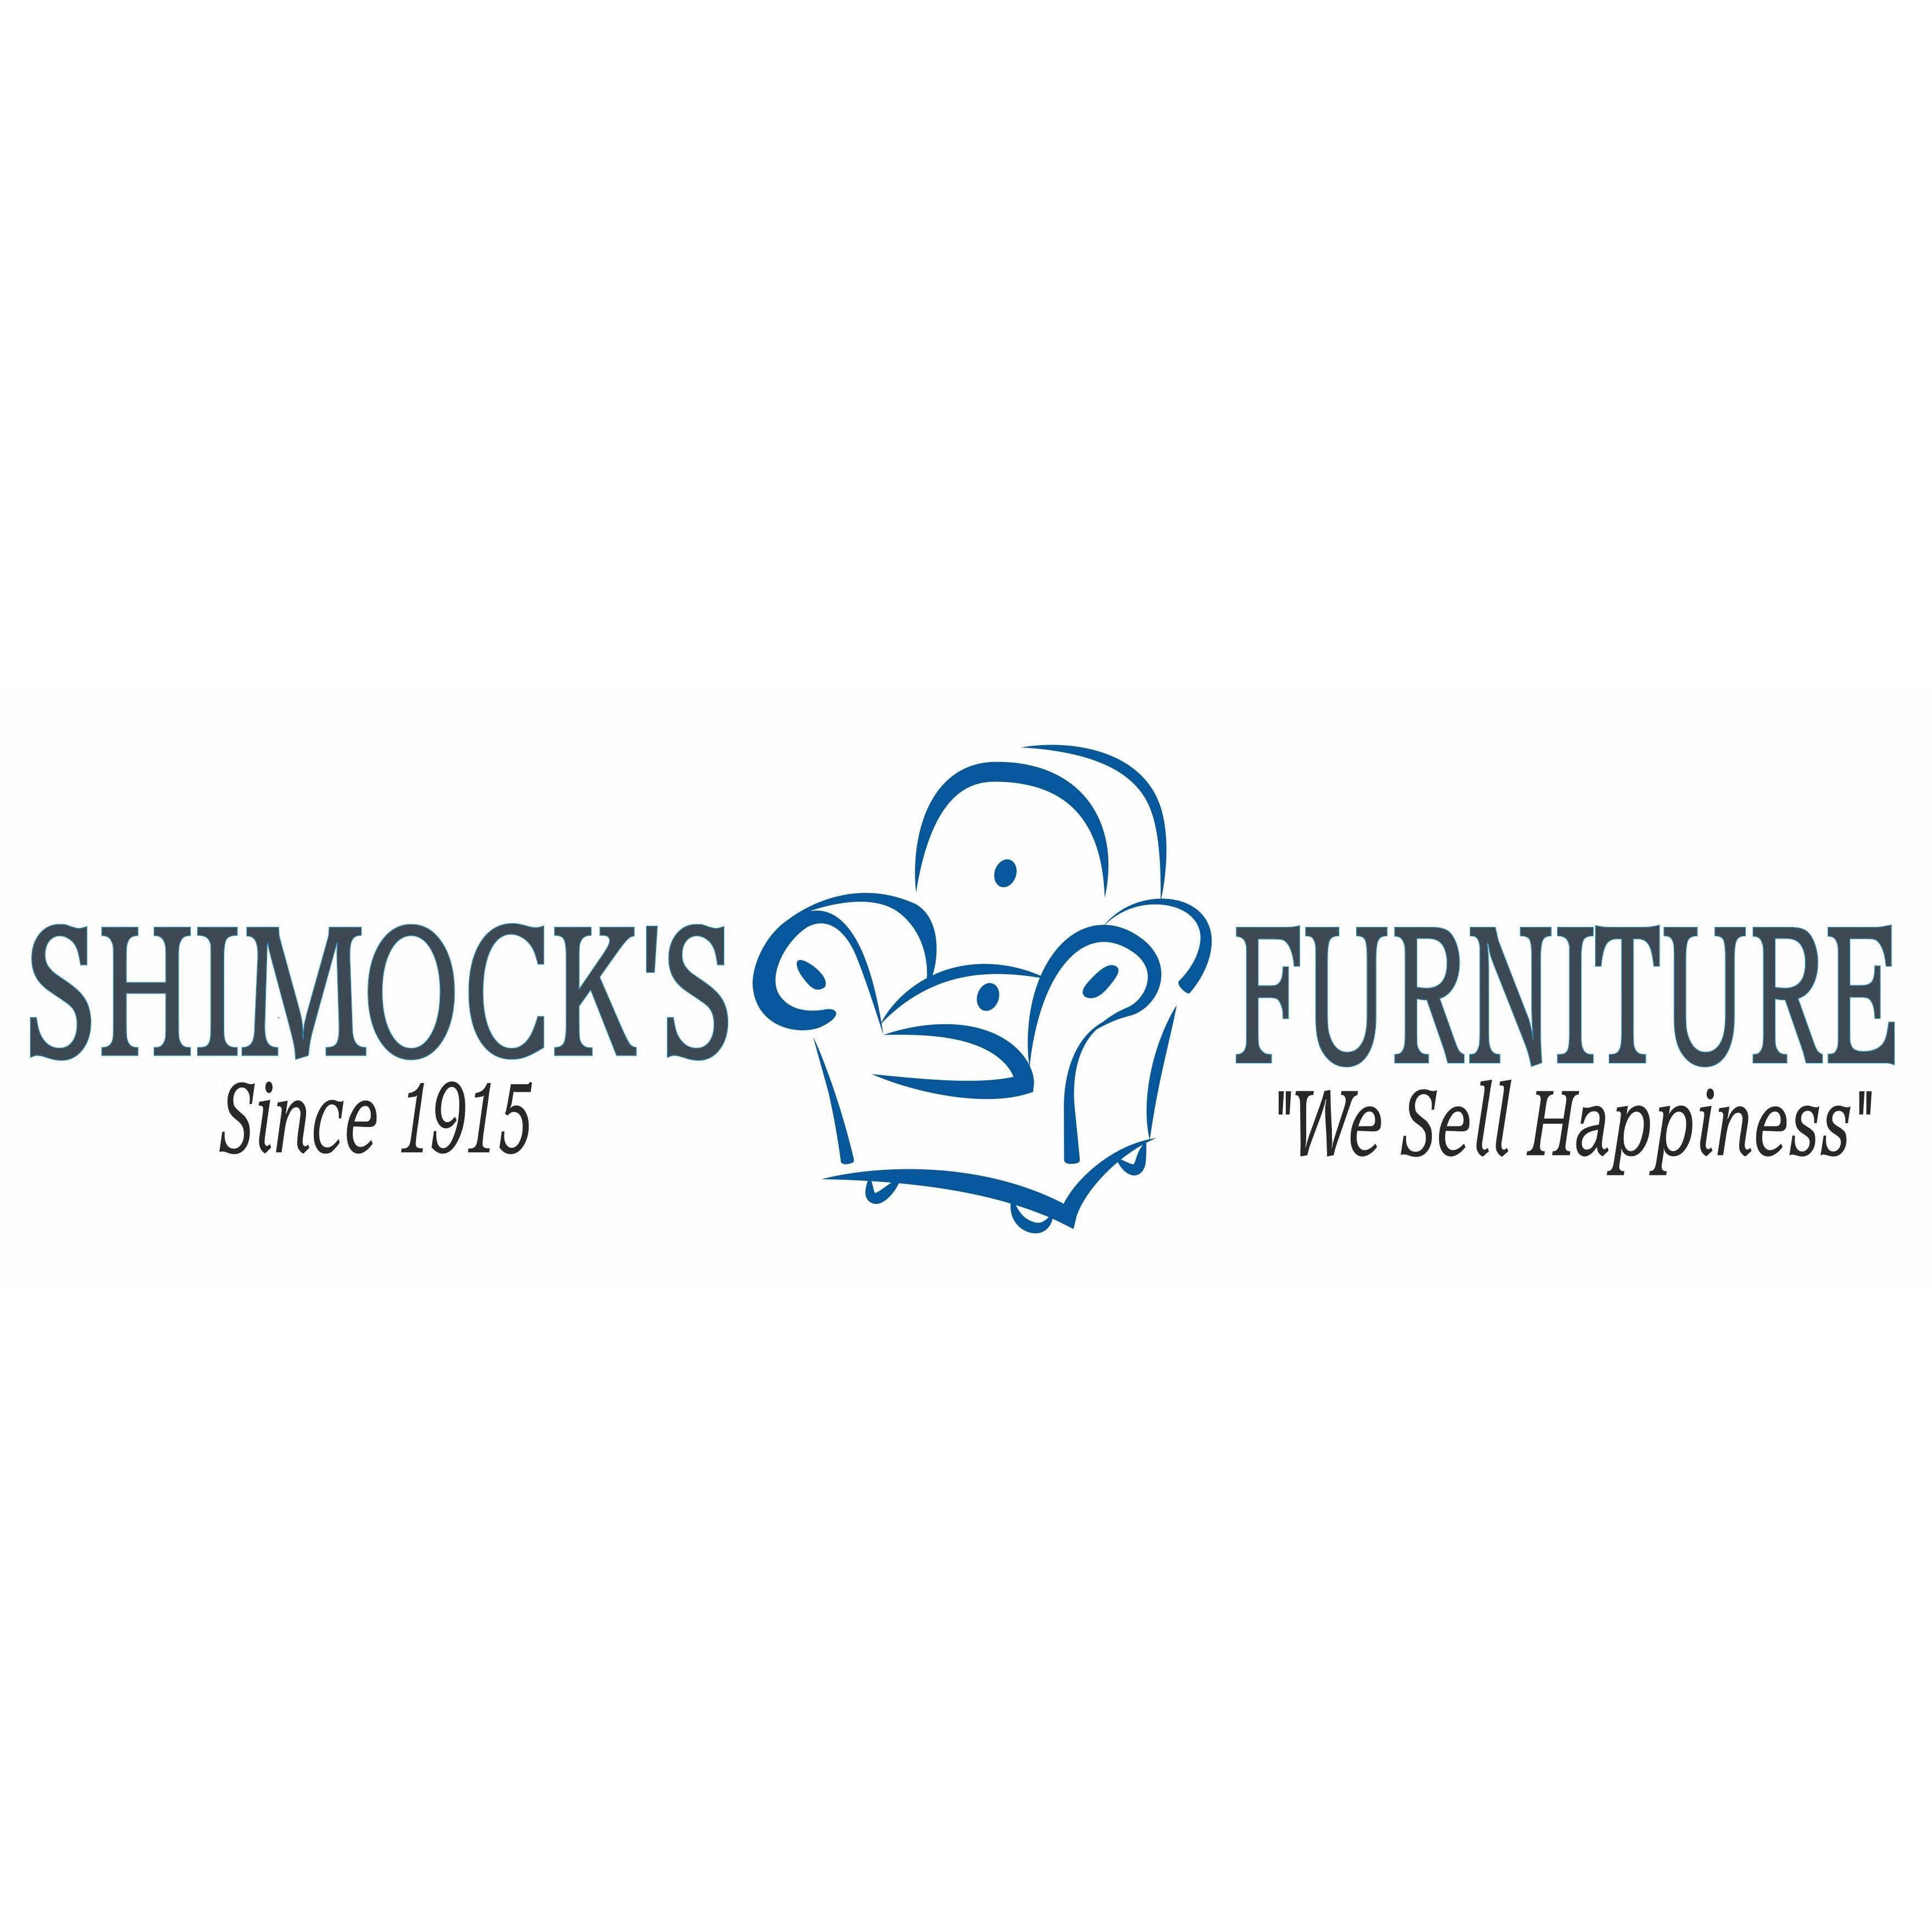 Shimocks Furniture image 2